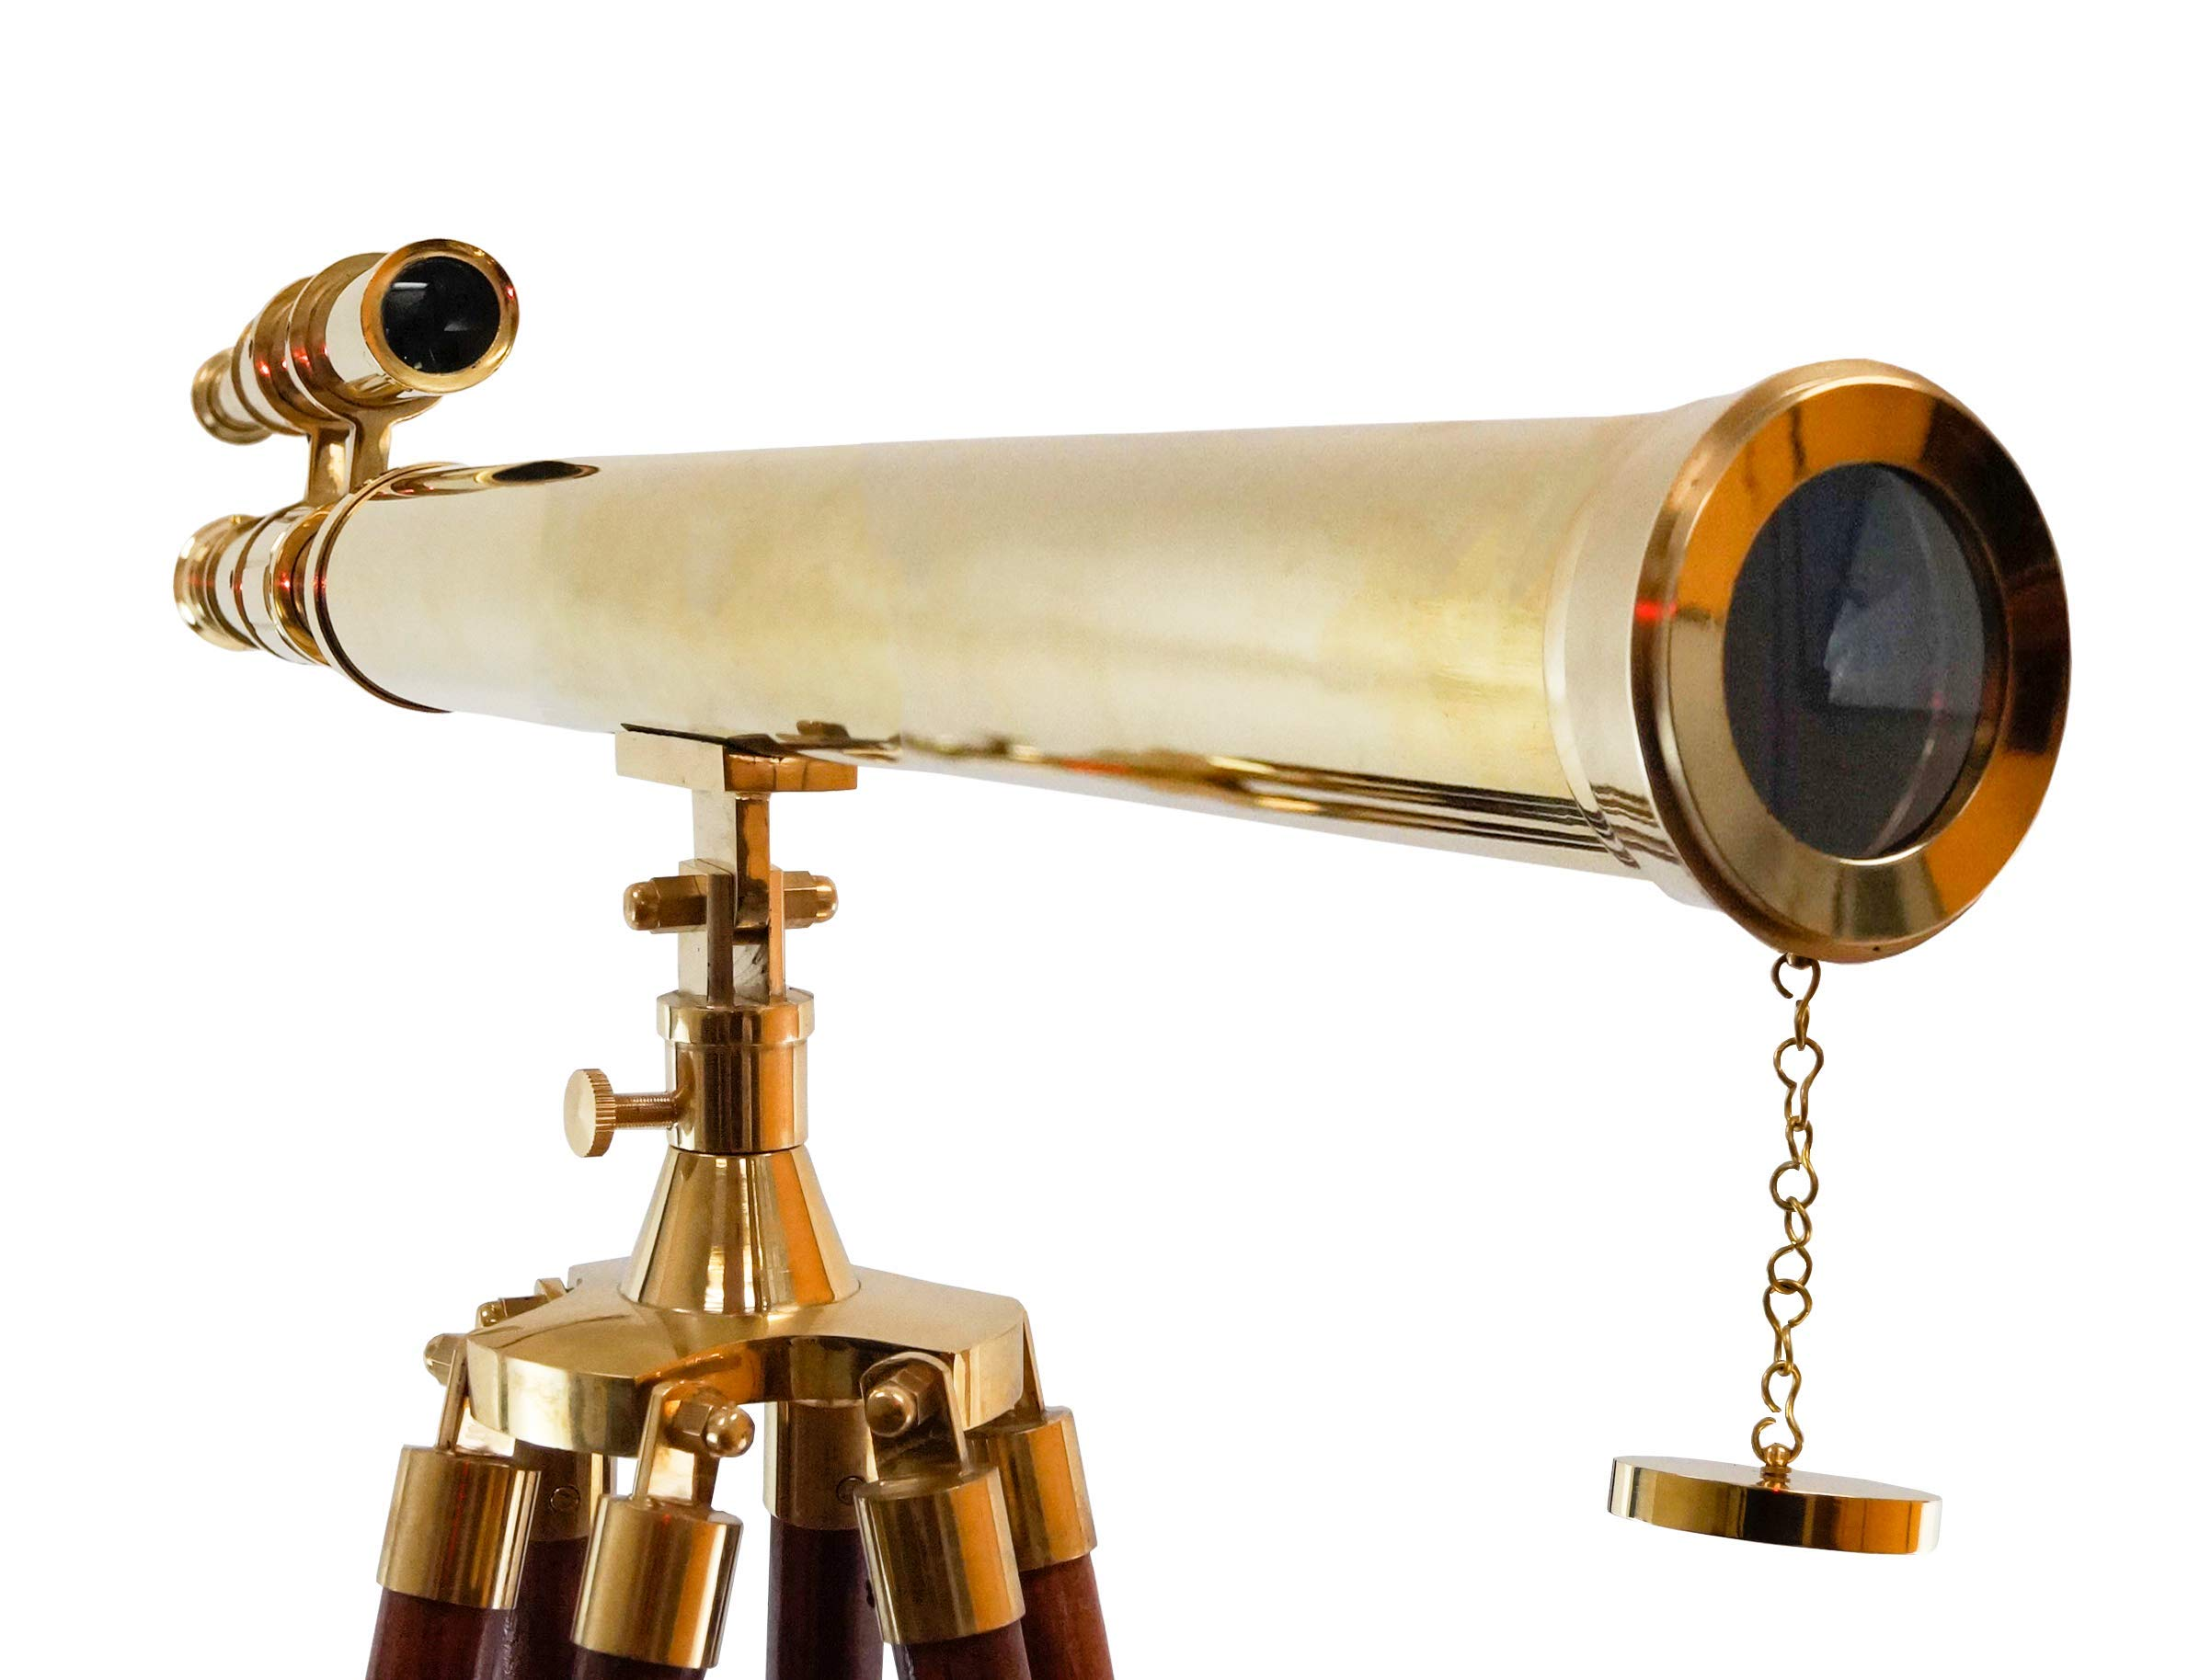 Nautical Collection's 64'' Decorative Floor Standing Tripod Brass Telescope Adjustable Size Sky Watcher (Griffith Astro Telescope)